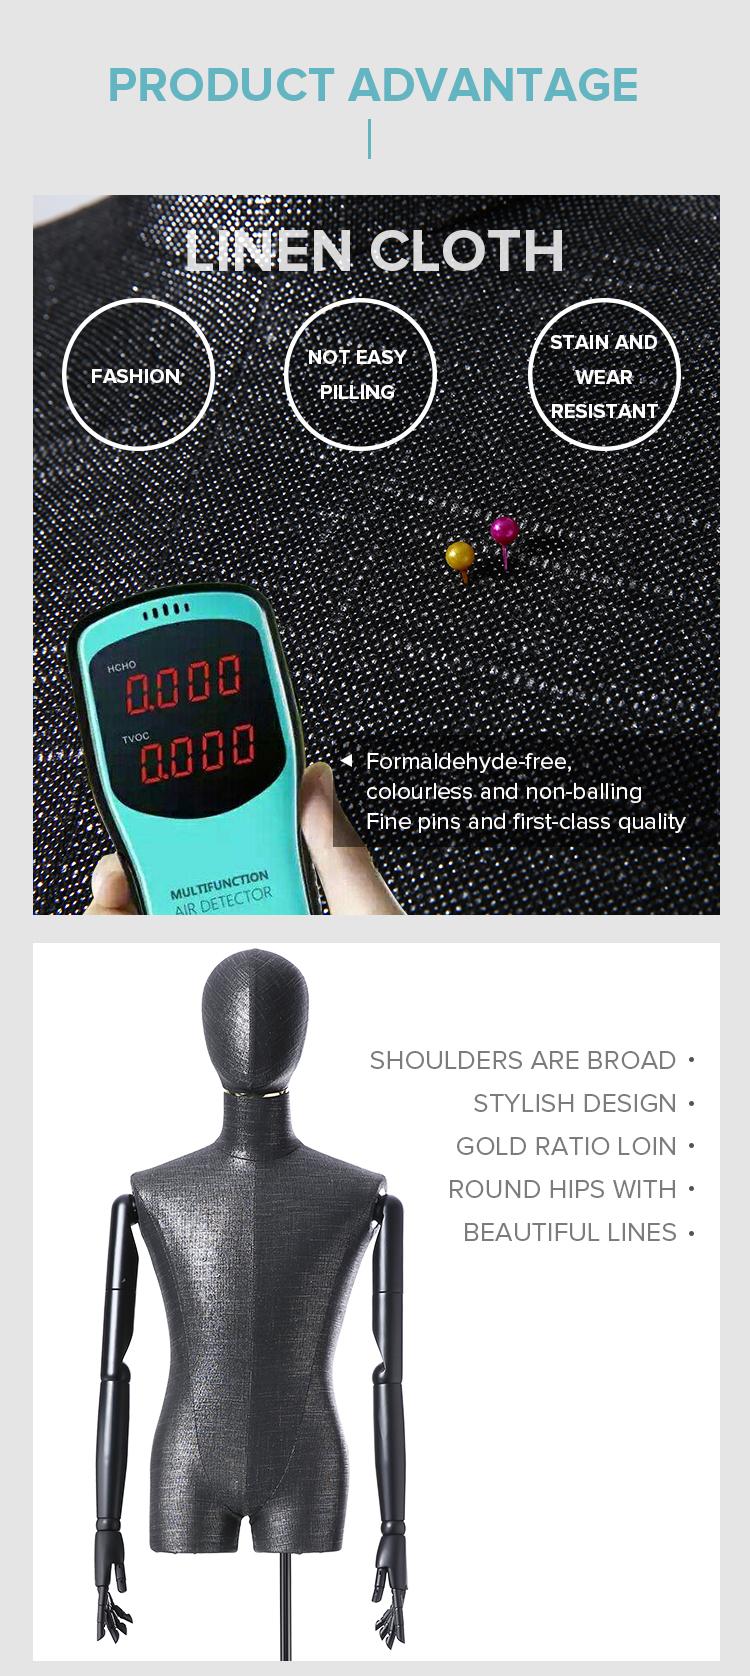 Inggris Gudang Disesuaikan Menyesuaikan Manekin Penjahit Boneka Dijual Hitam Manekin Kepala Torso Tampilan Model untuk Butik